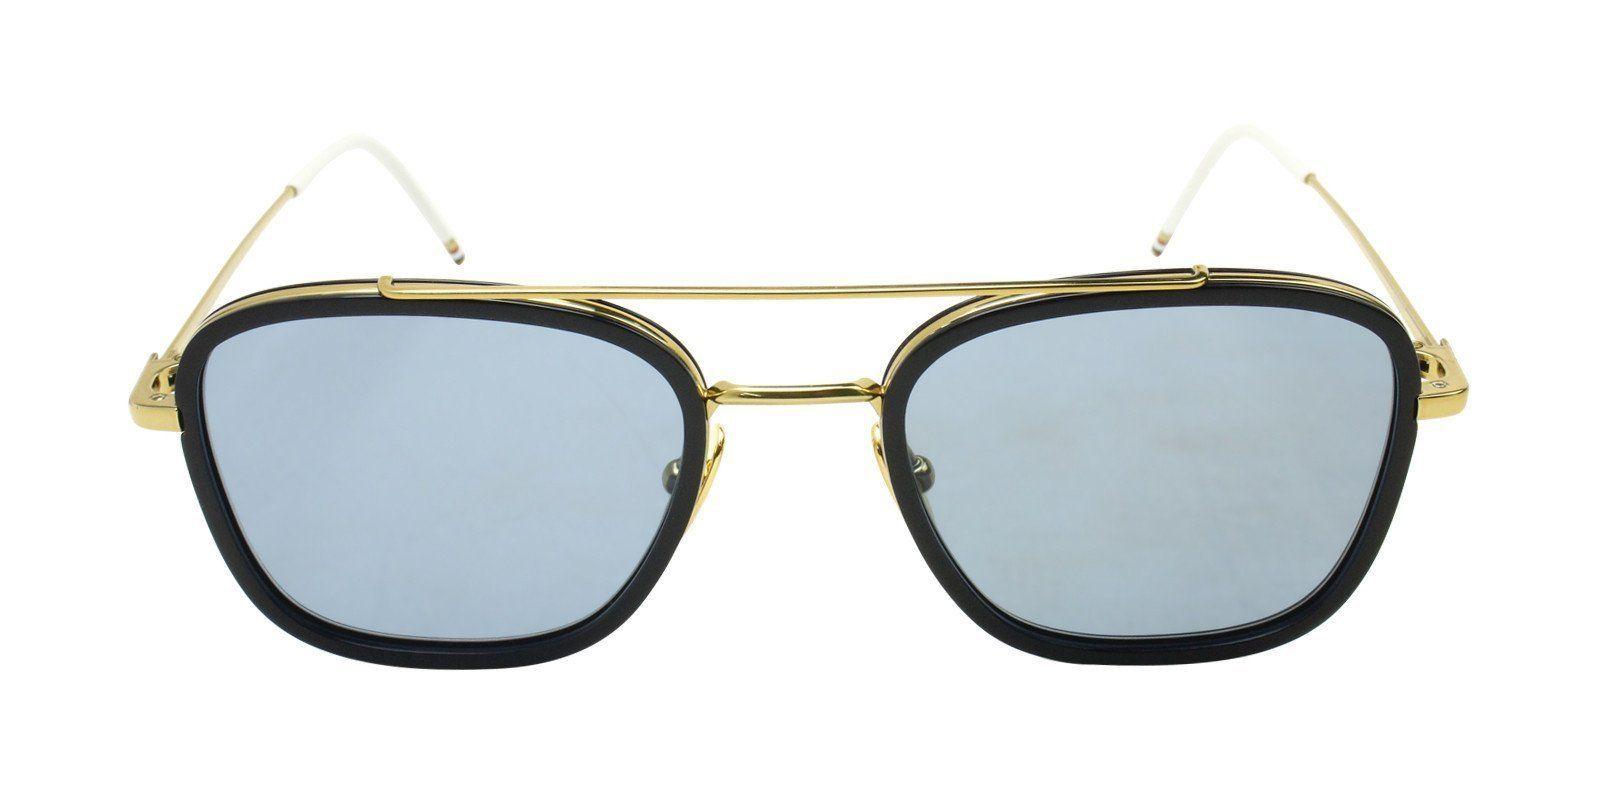 39ff01657577 Thom Browne - TB800B Blue - Blue sunglasses   Products